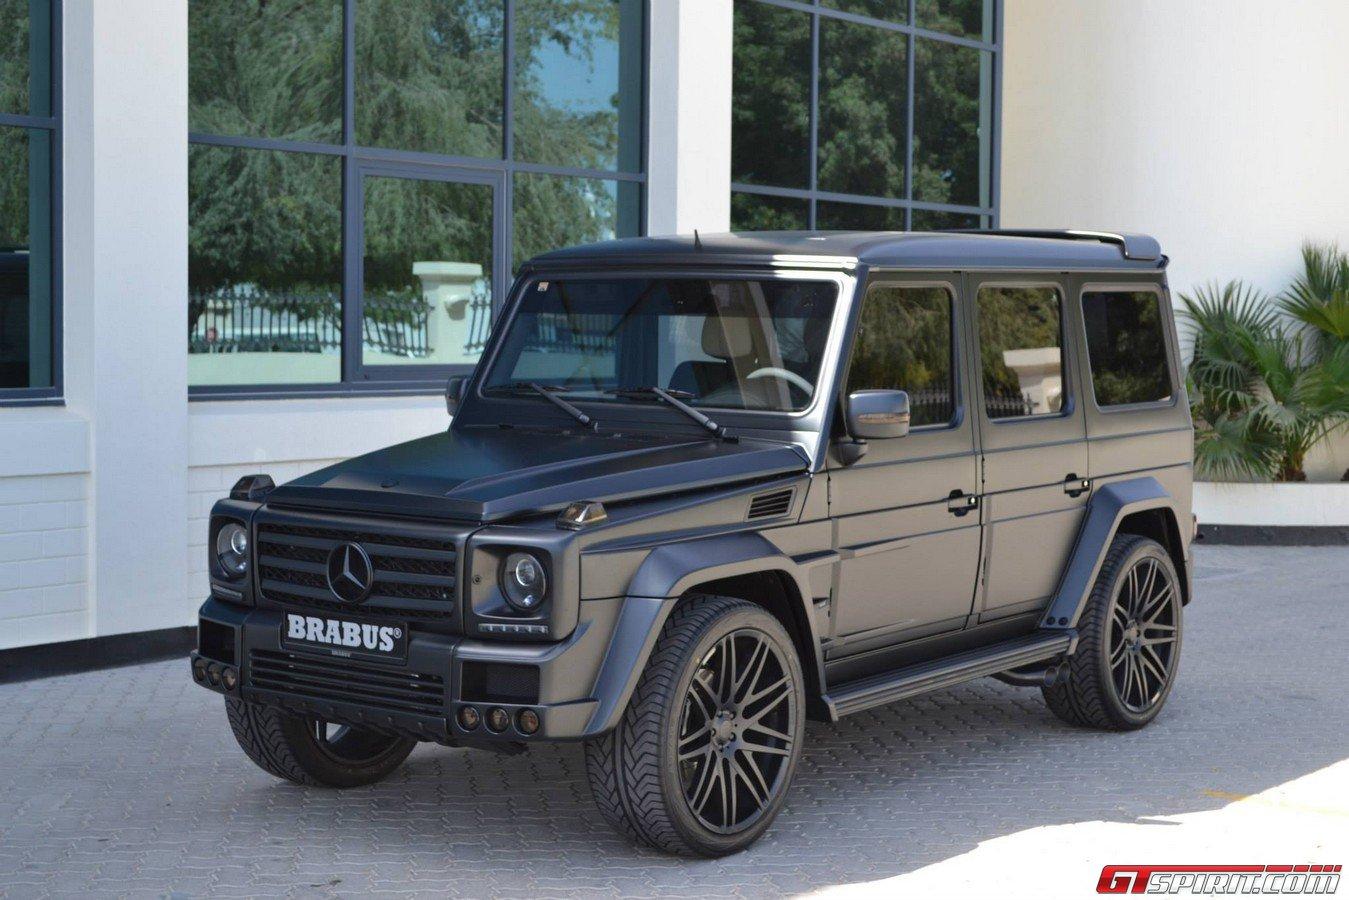 Gallery matte black brabus widestar g55 amg in saudi for Mercedes benz jeep matte black